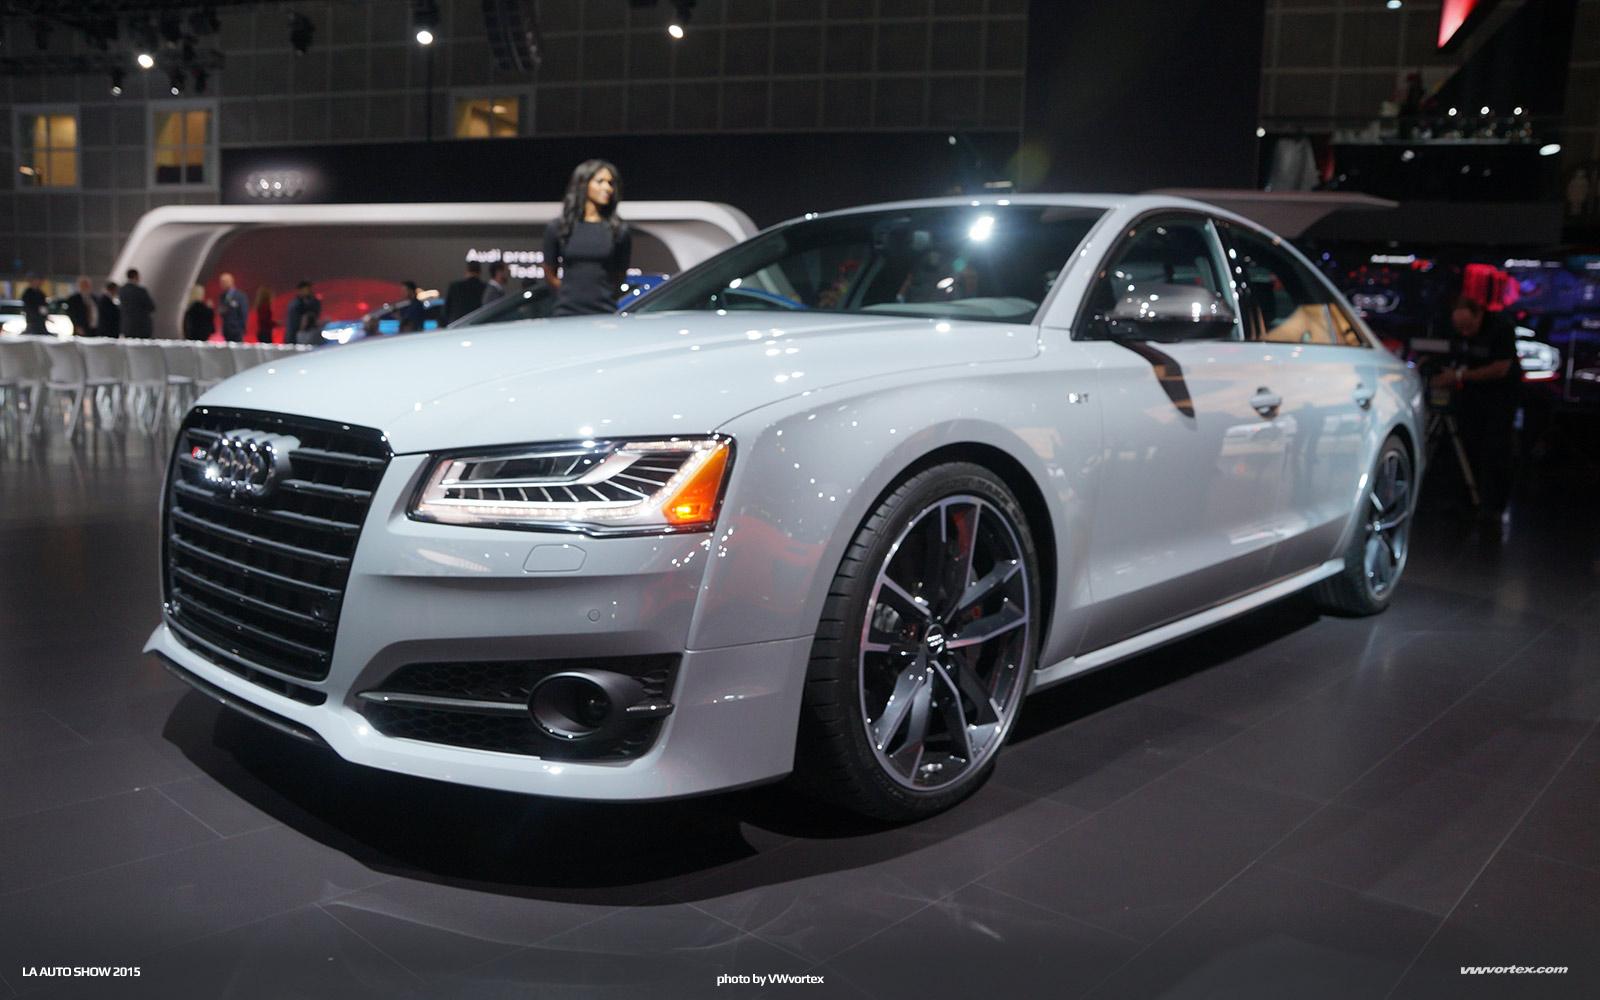 Audi-S4-Nogaro-Blue-Nardo-Grey-Keys-Audi-829